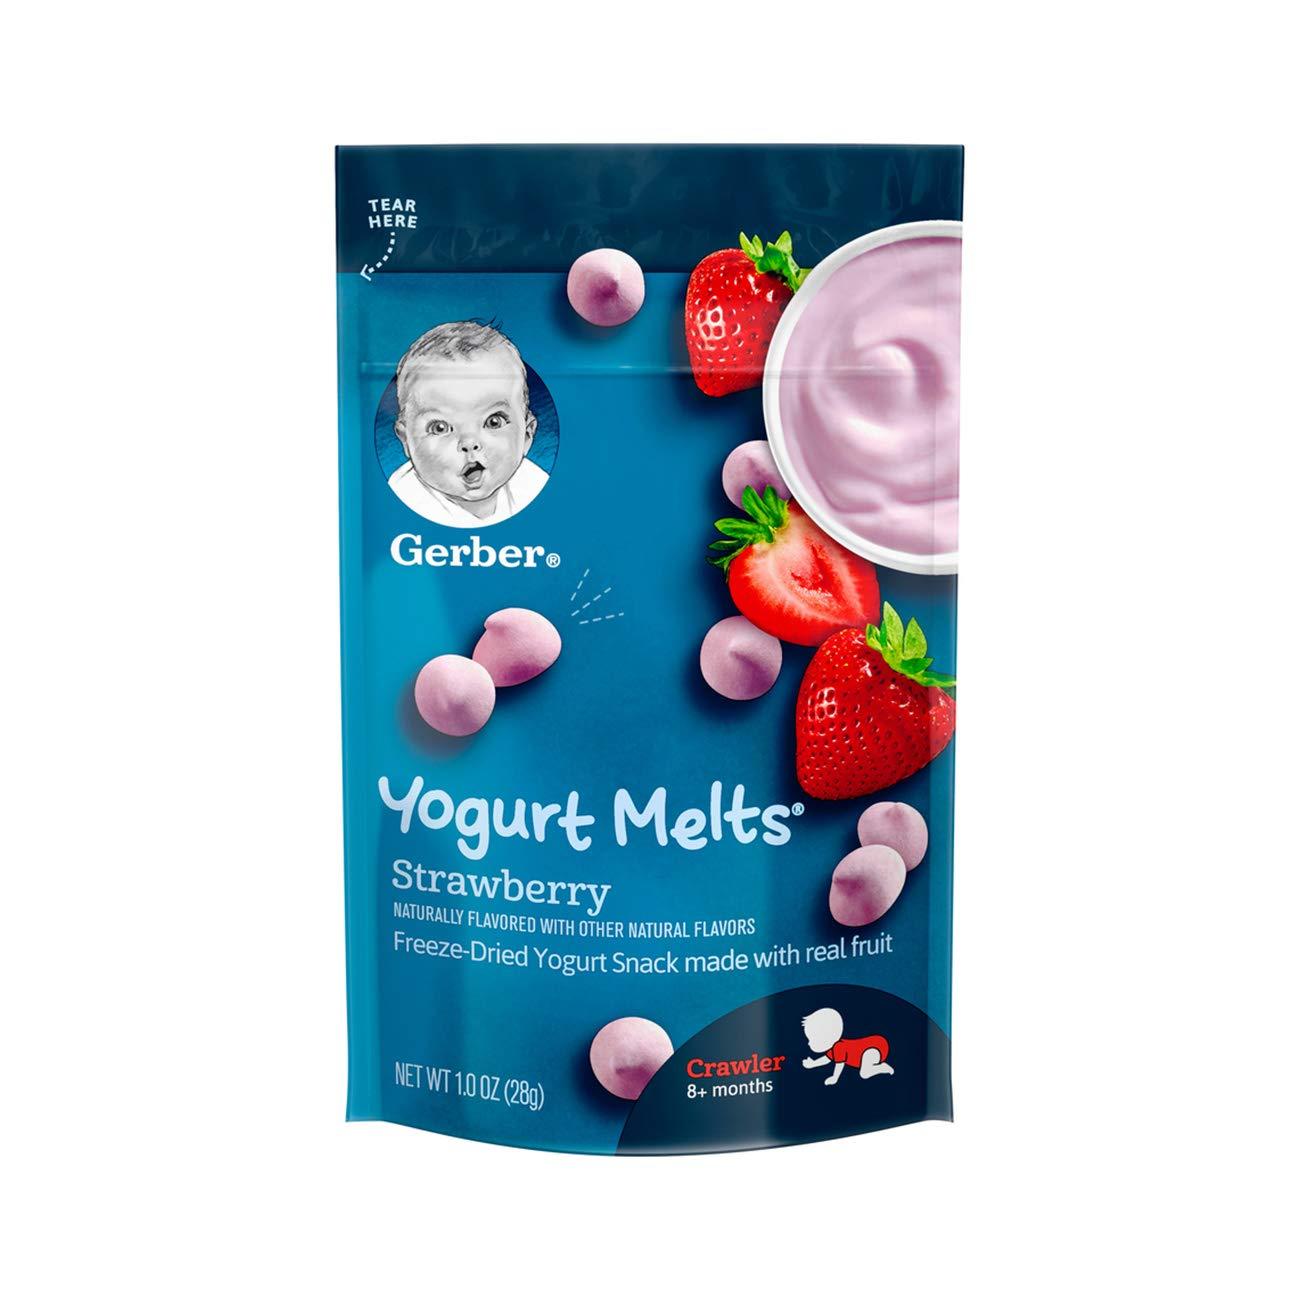 Gerber Yogurt Melts Freeze-Dried Yogurt Snack made with real fruit, Strawberry, 1 oz